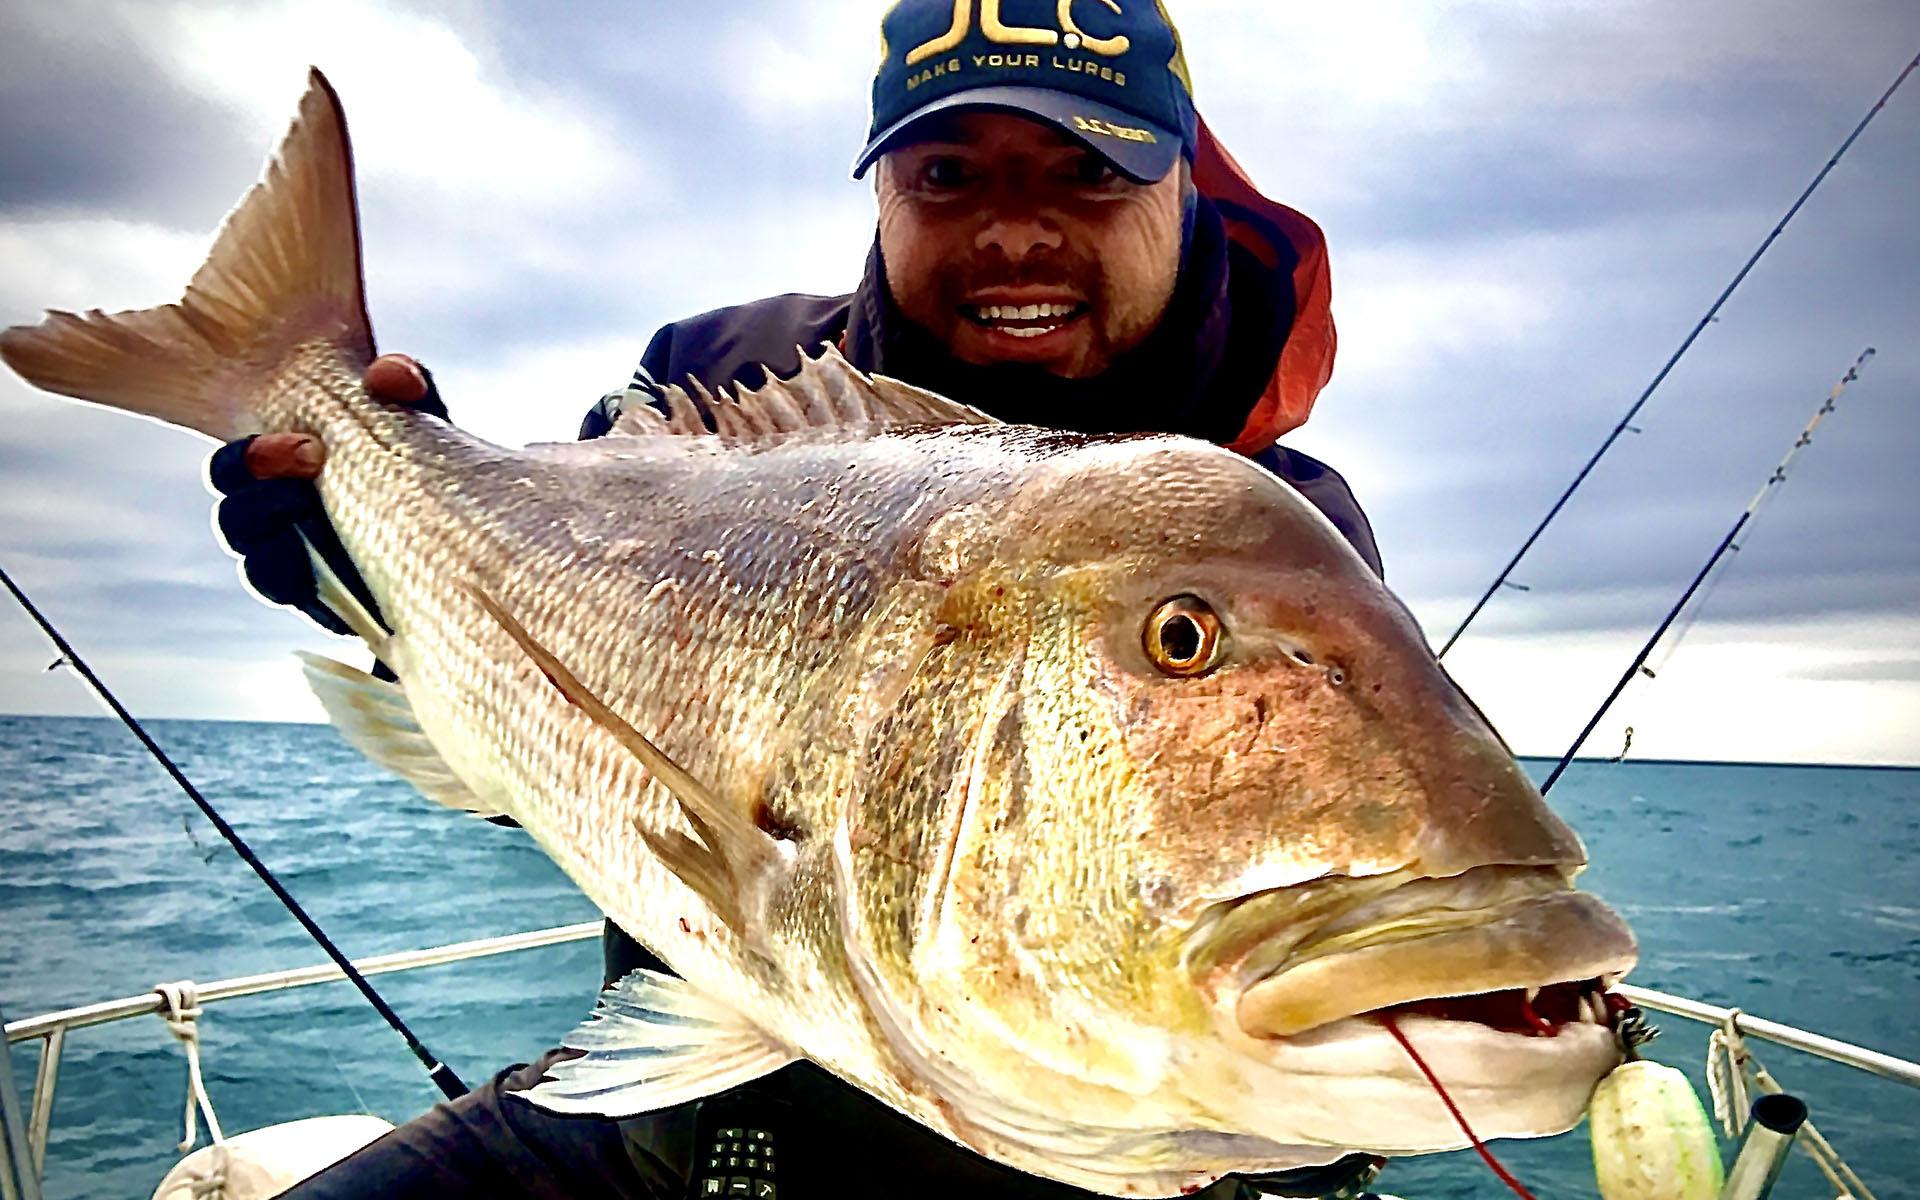 Pesca en Salou (barco en exclusiva)